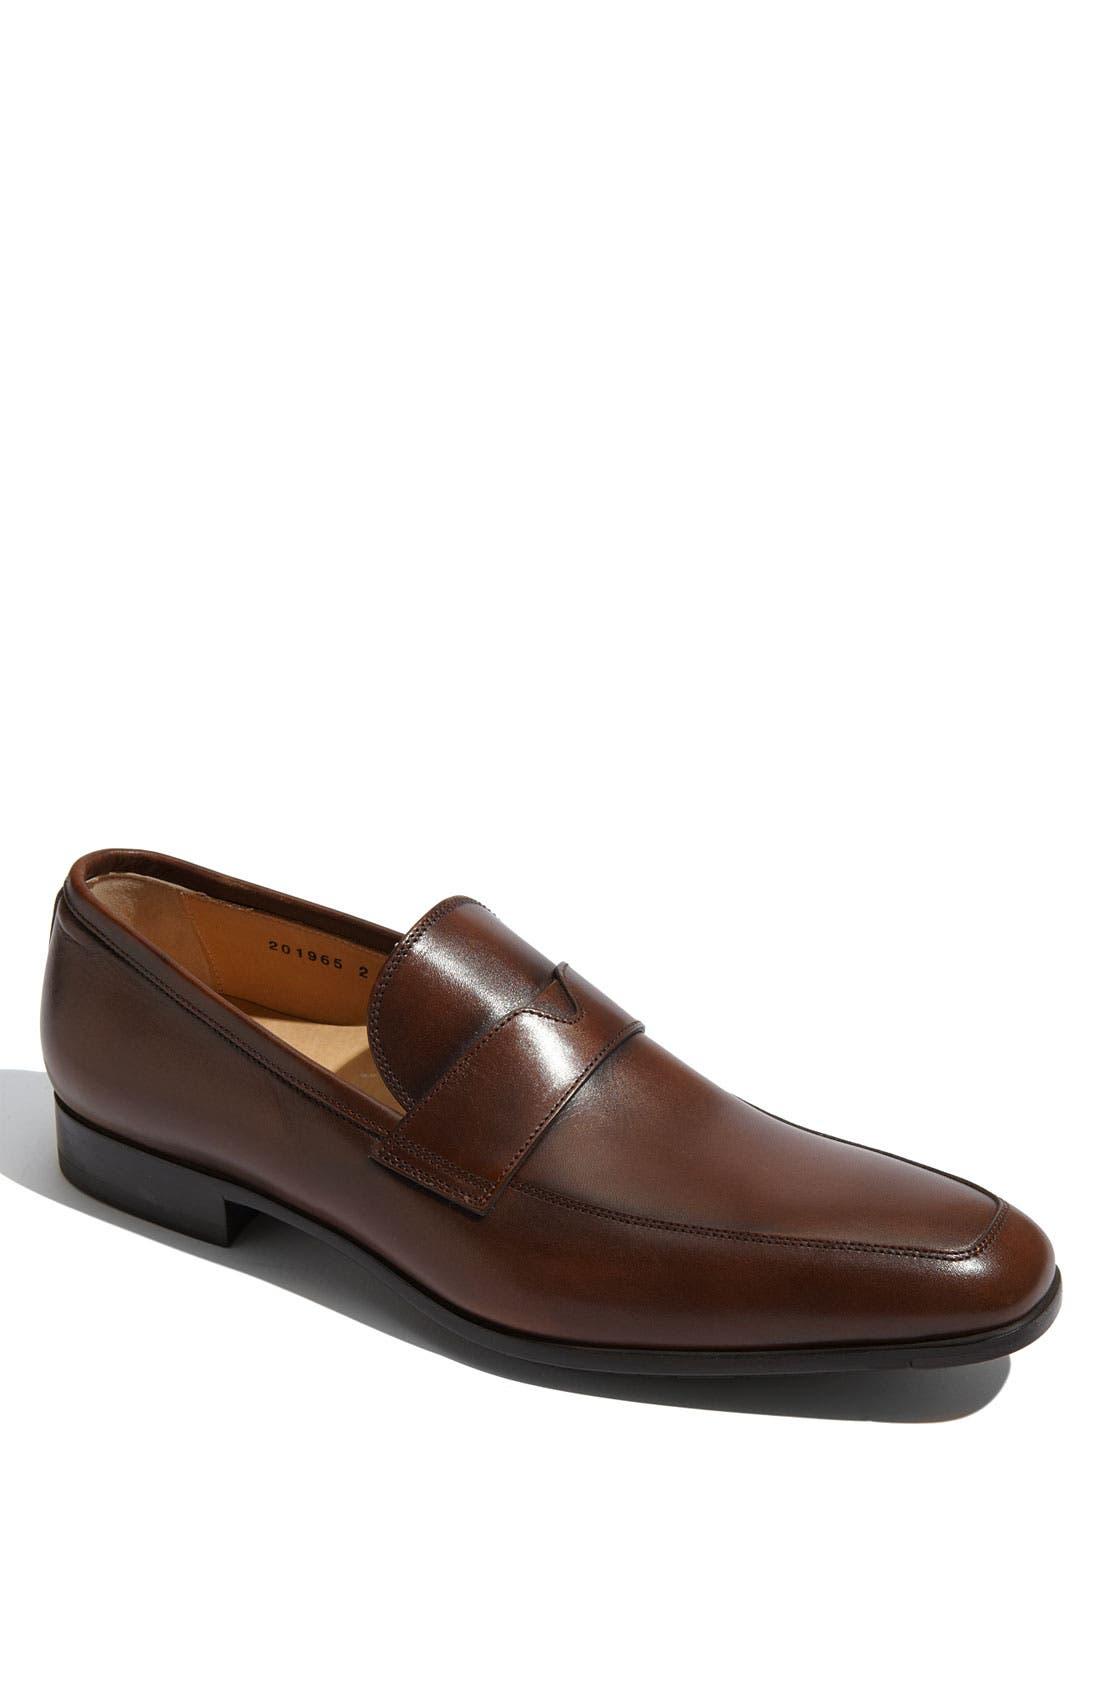 Main Image - Santoni 'Quinlan' Loafer